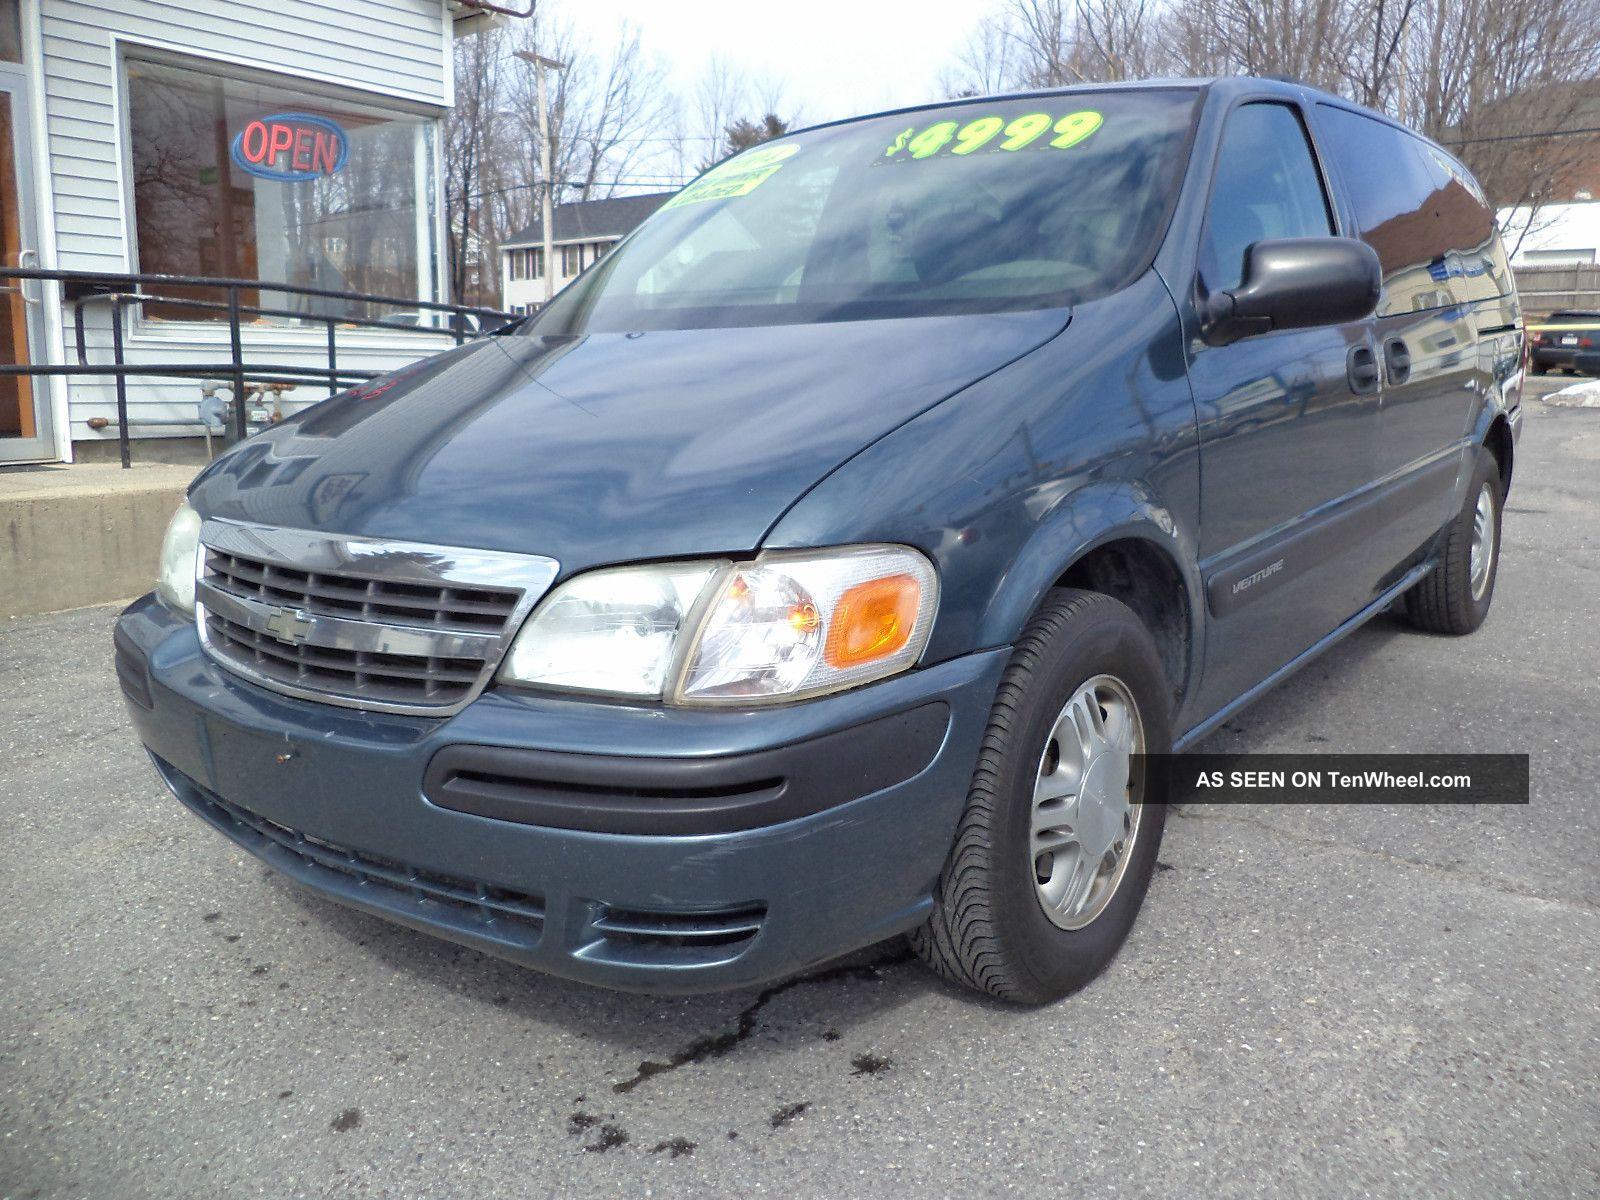 2004 Chevrolet Venture Expert Reviews Specs and Photos